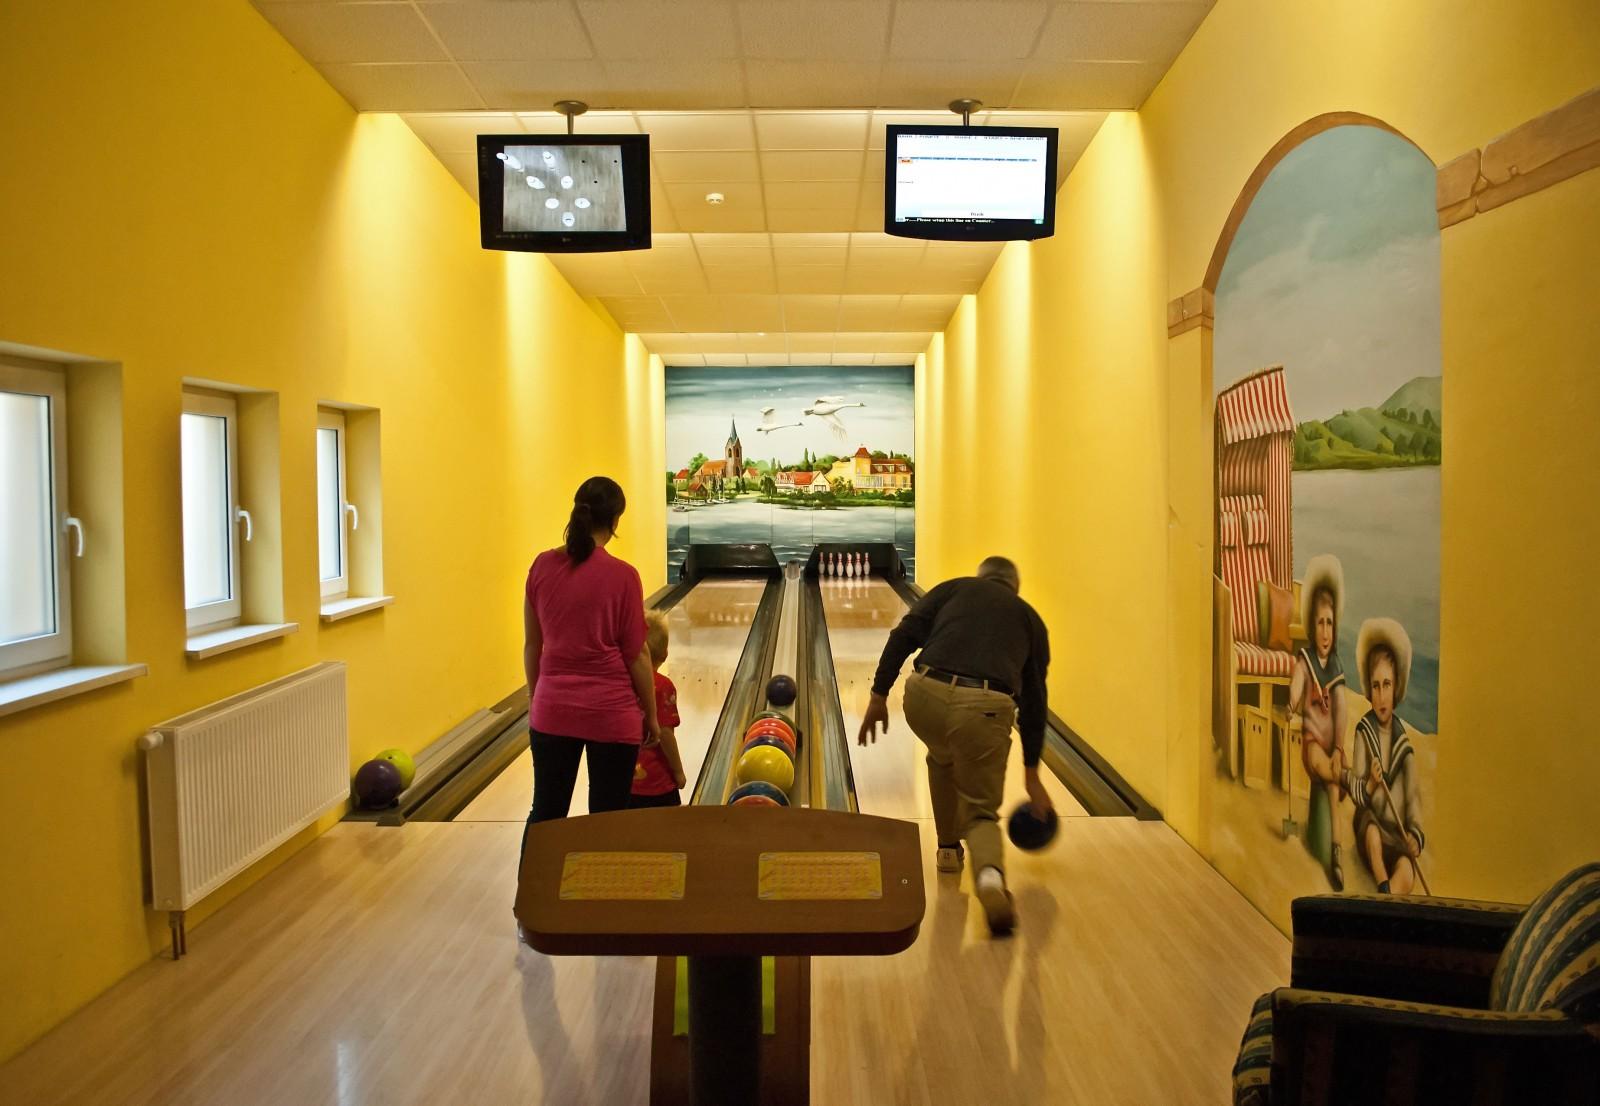 Bowlingwochenende im Strandhotel Aseleben, Süßer See